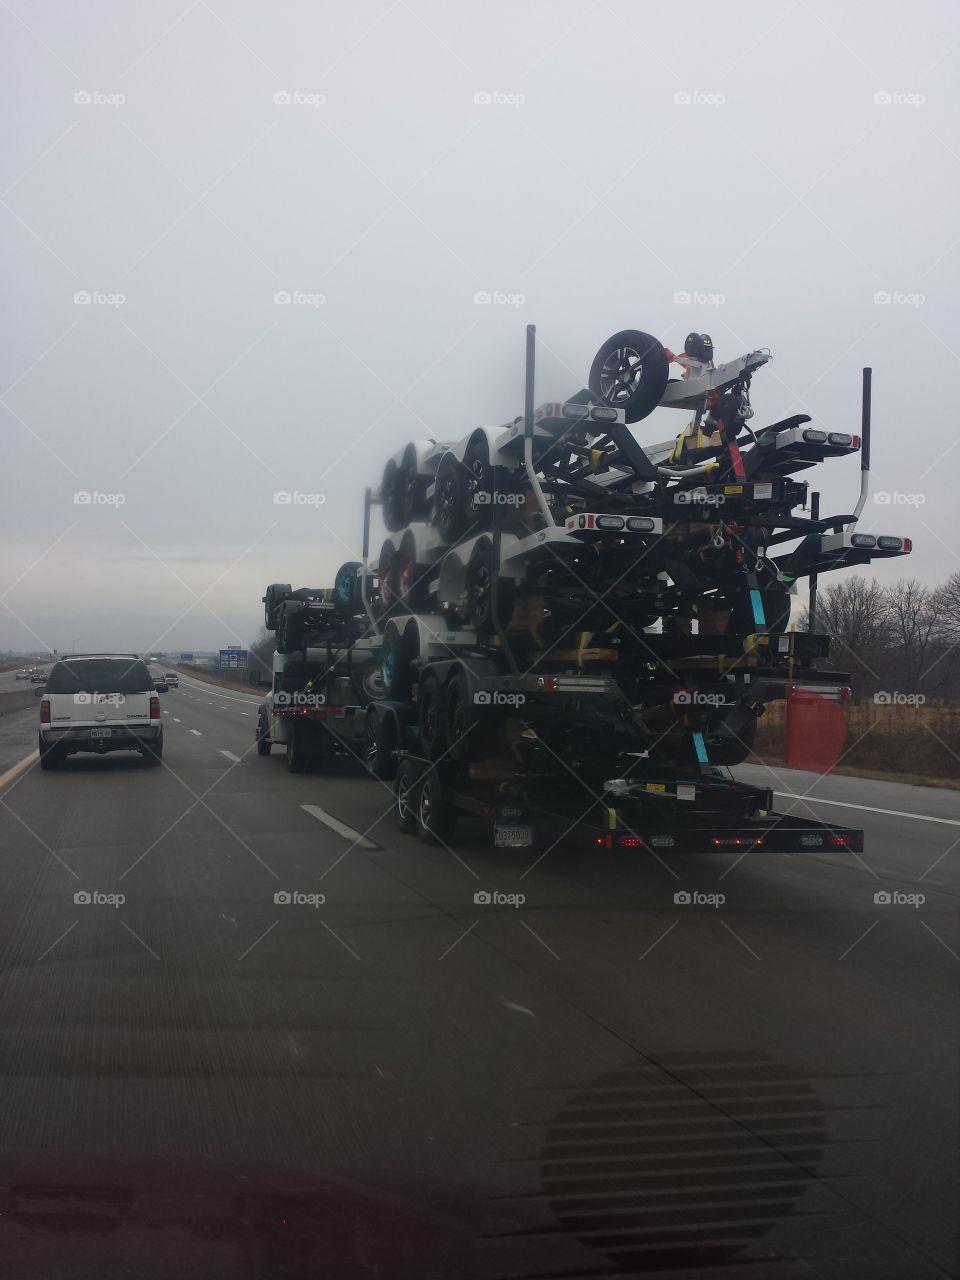 trailer full of trailers